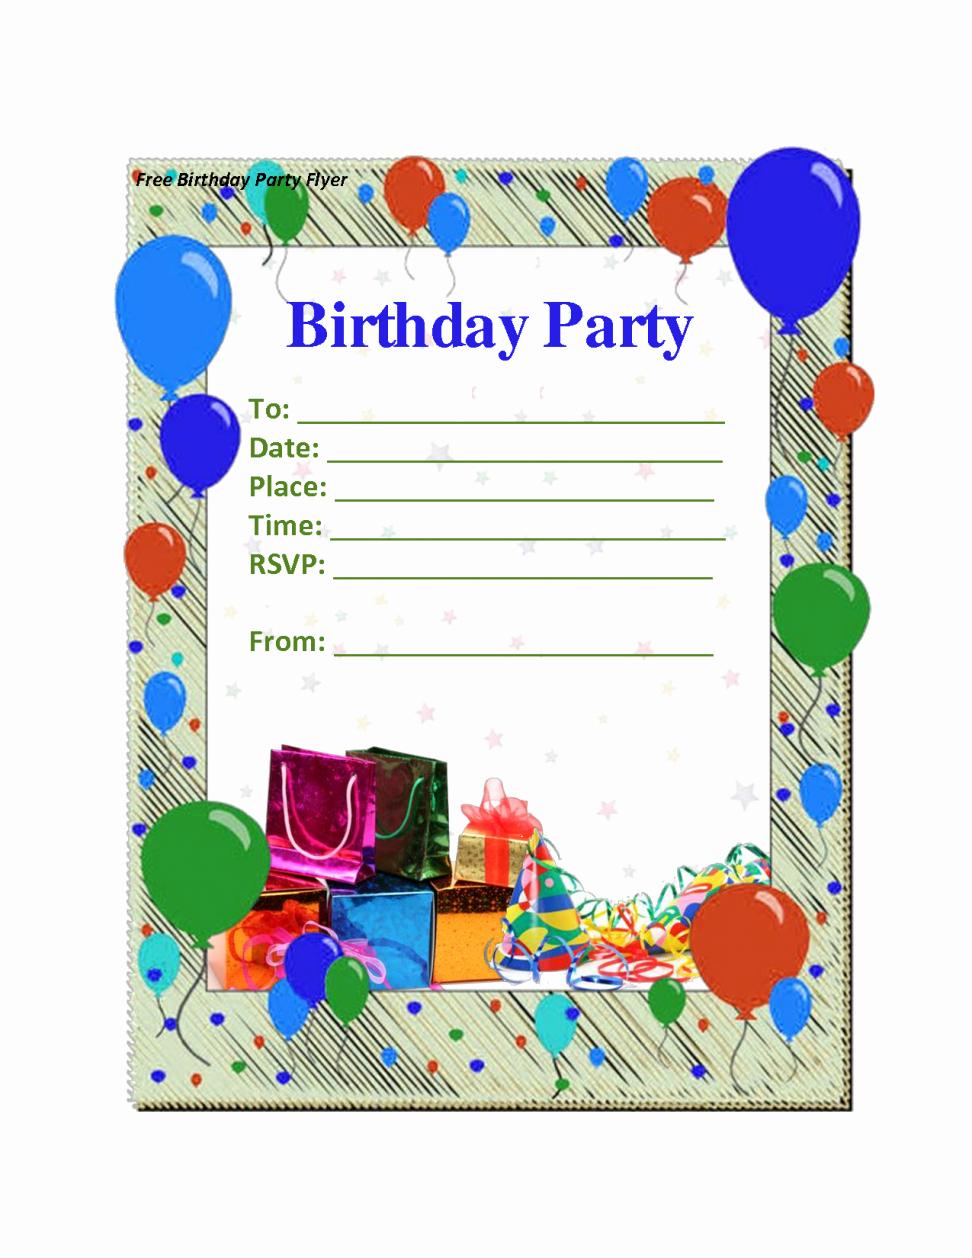 Kids Birthday Party Invites Templates Beautiful Free Printable Kids Birthday Party Invitations Templates